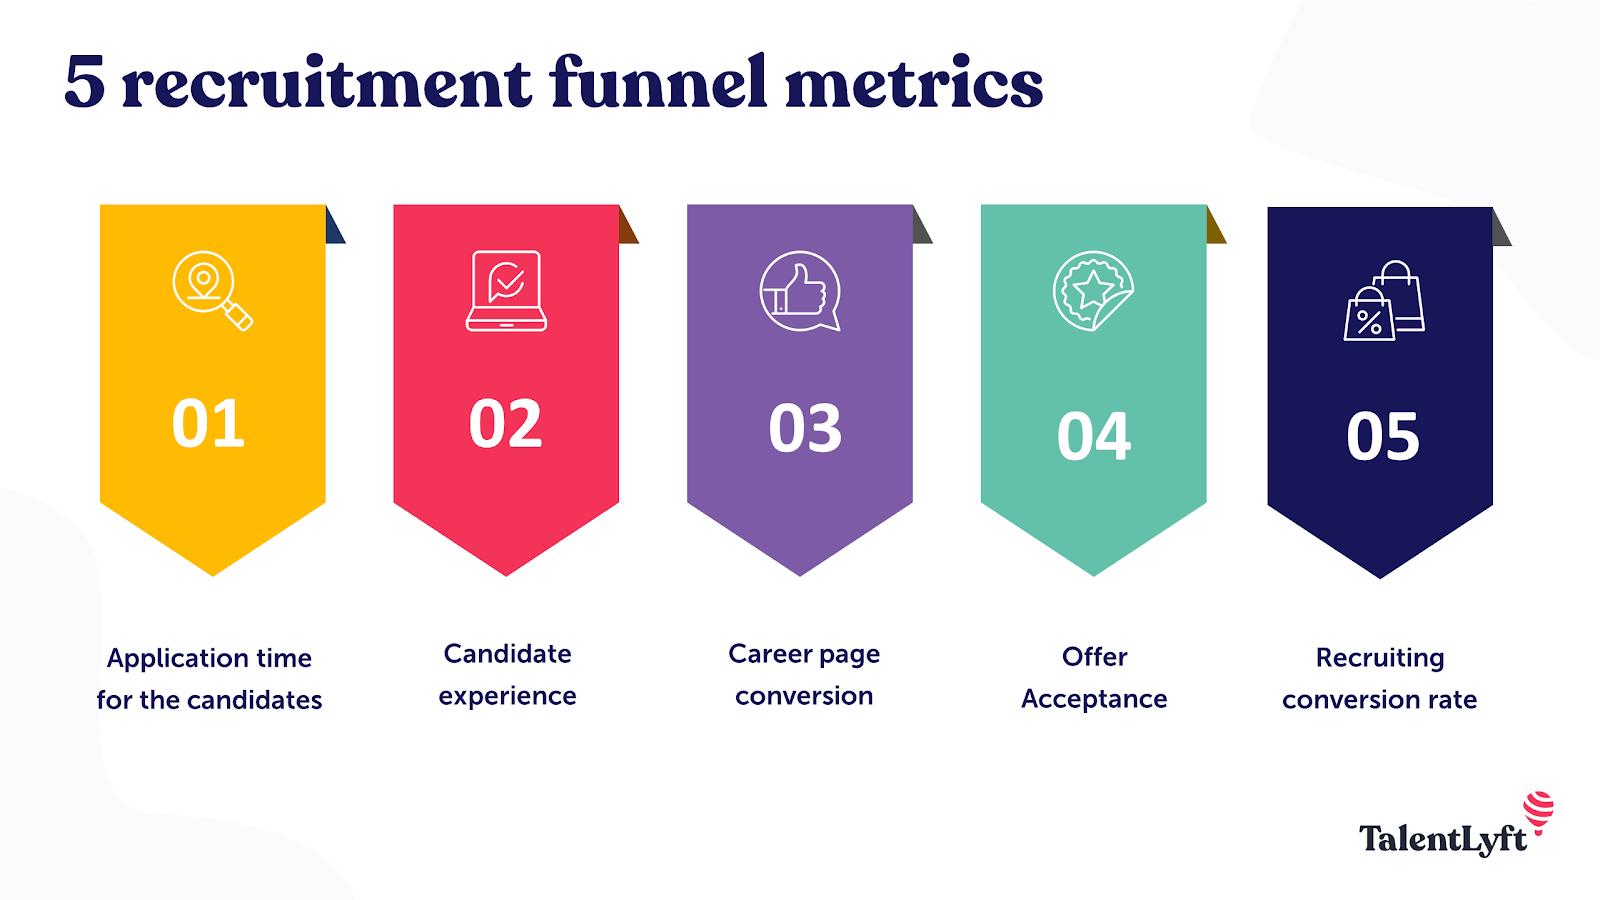 Recruitment funnel metrics